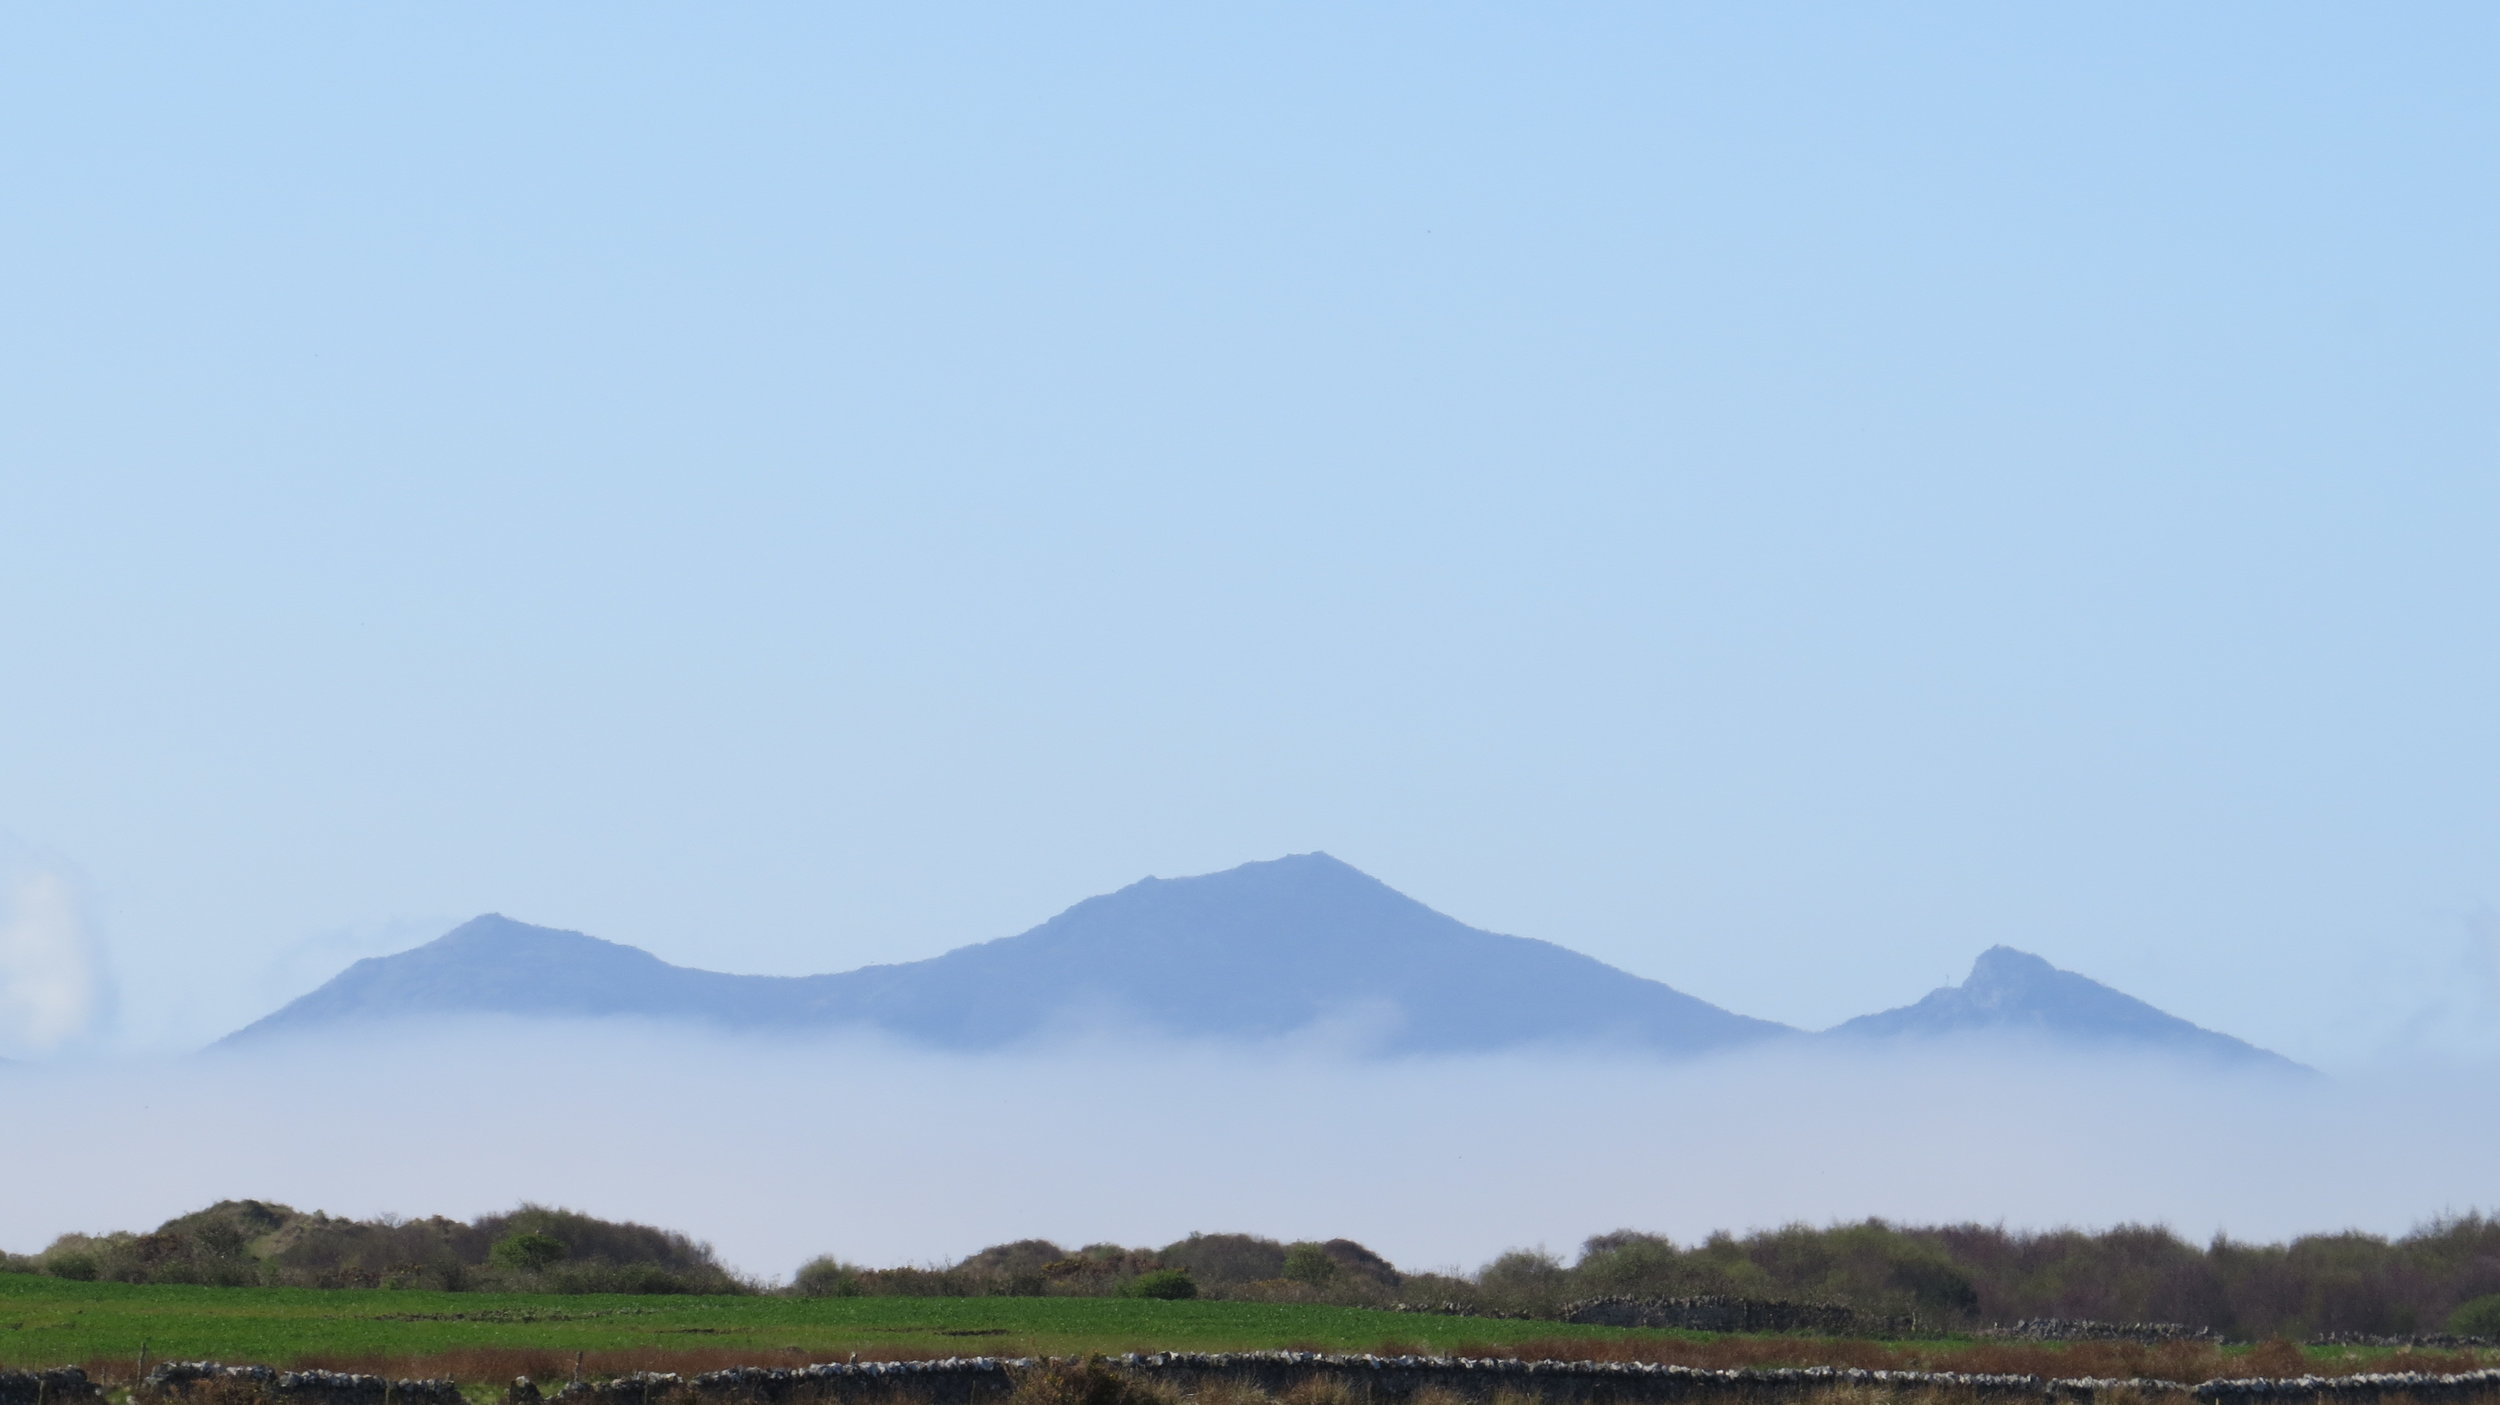 Looking back towards Snowdonia